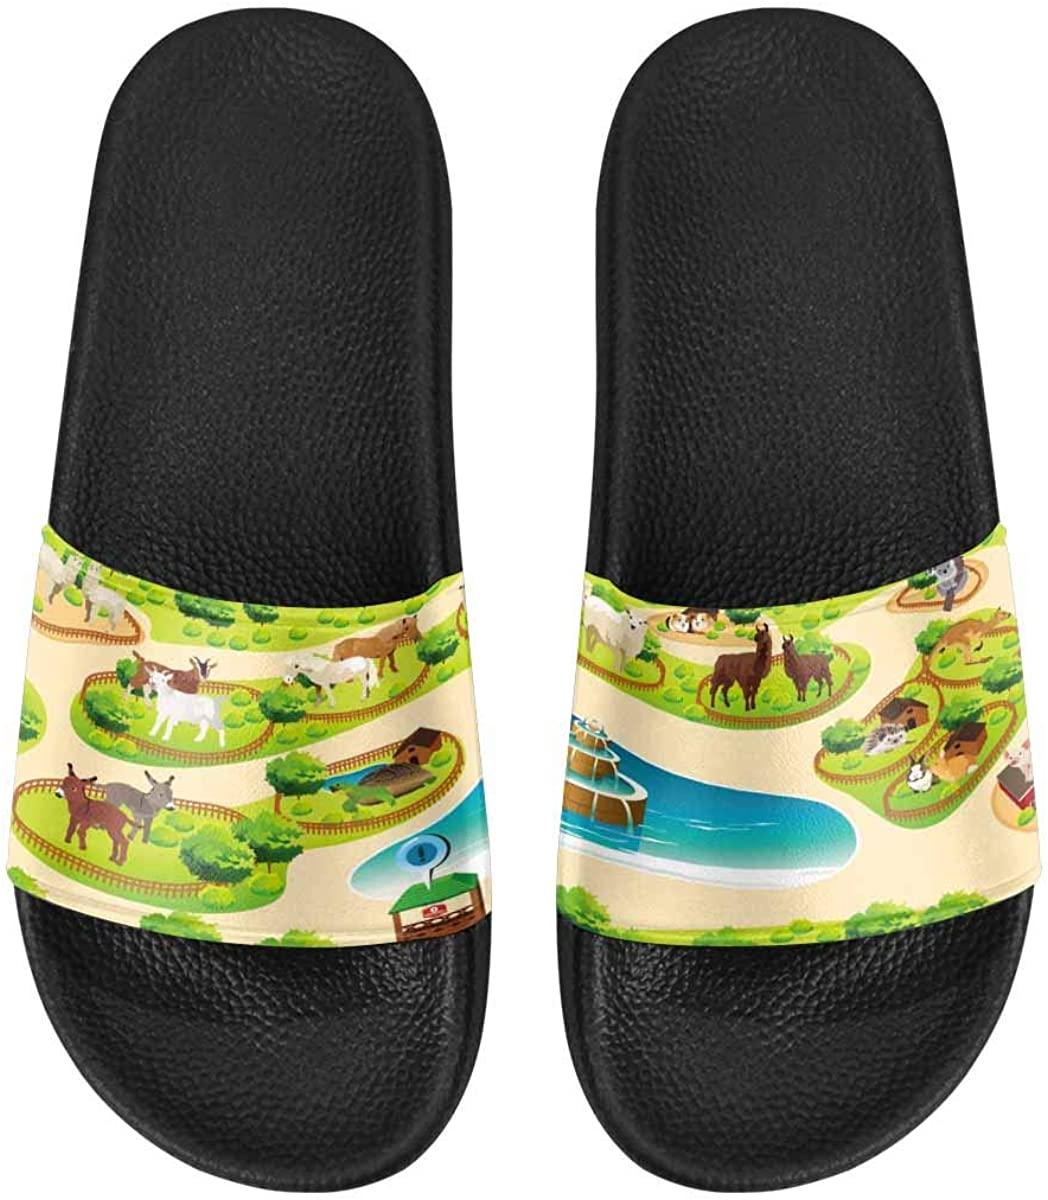 InterestPrint Women's Casual and Lightweight Slipper Sandals for Outside Peonies Flower and Butterflies